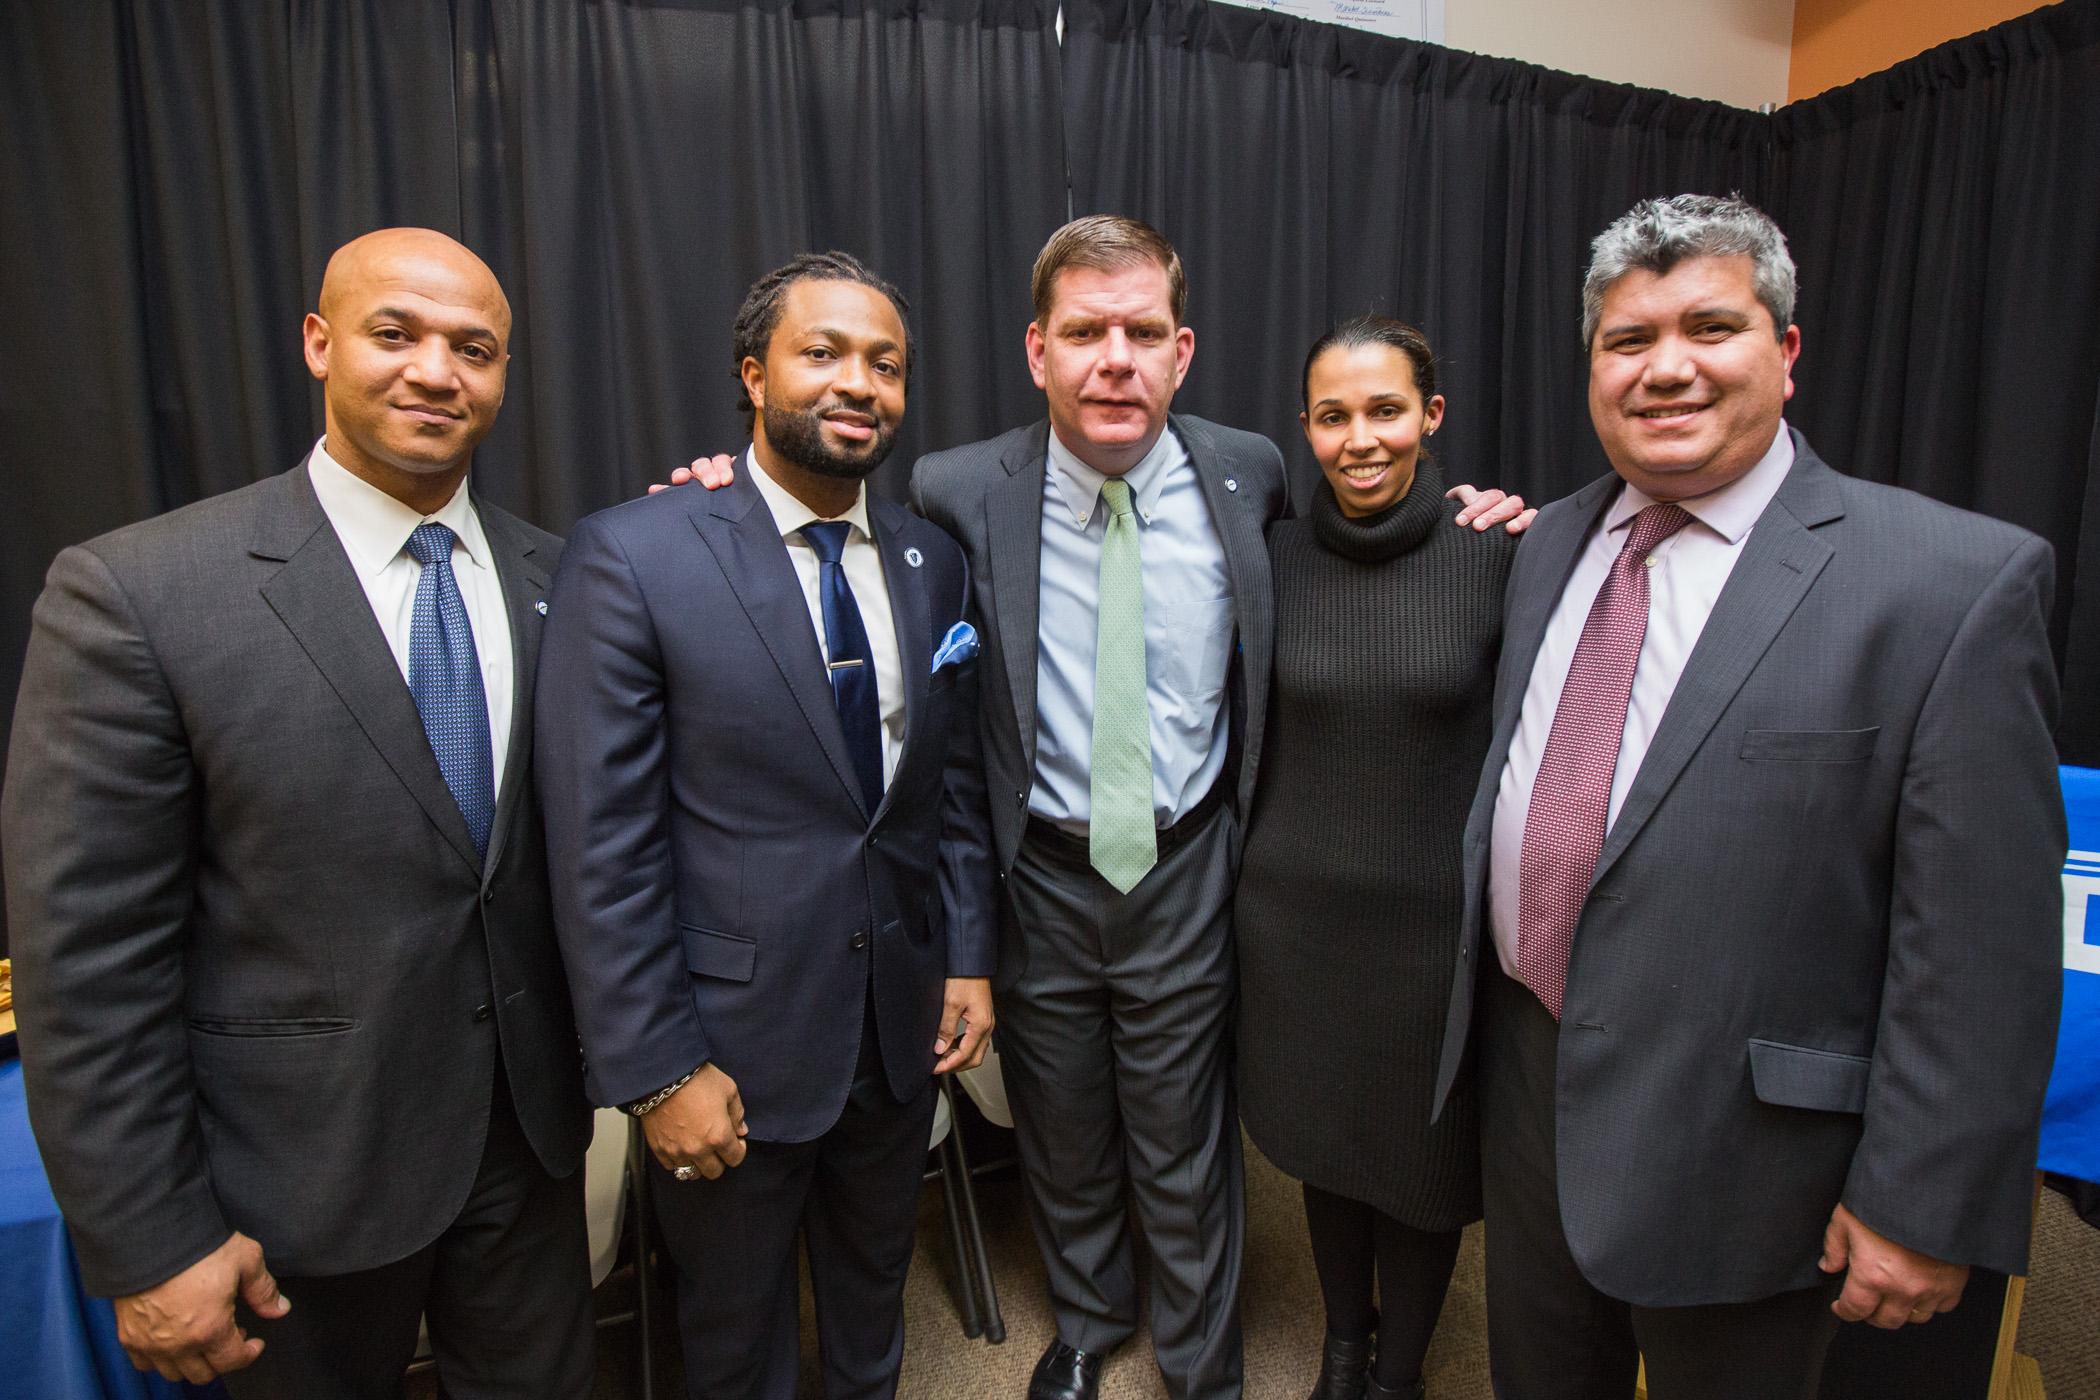 Left to right: John Barros, Boston's Chief of Economic Development; State Representative Evandro Carvalho; Mayor Marty Walsh; Keila Barros, DSNI's Board President; and Juan Leyton, DSNI's Executive Director.